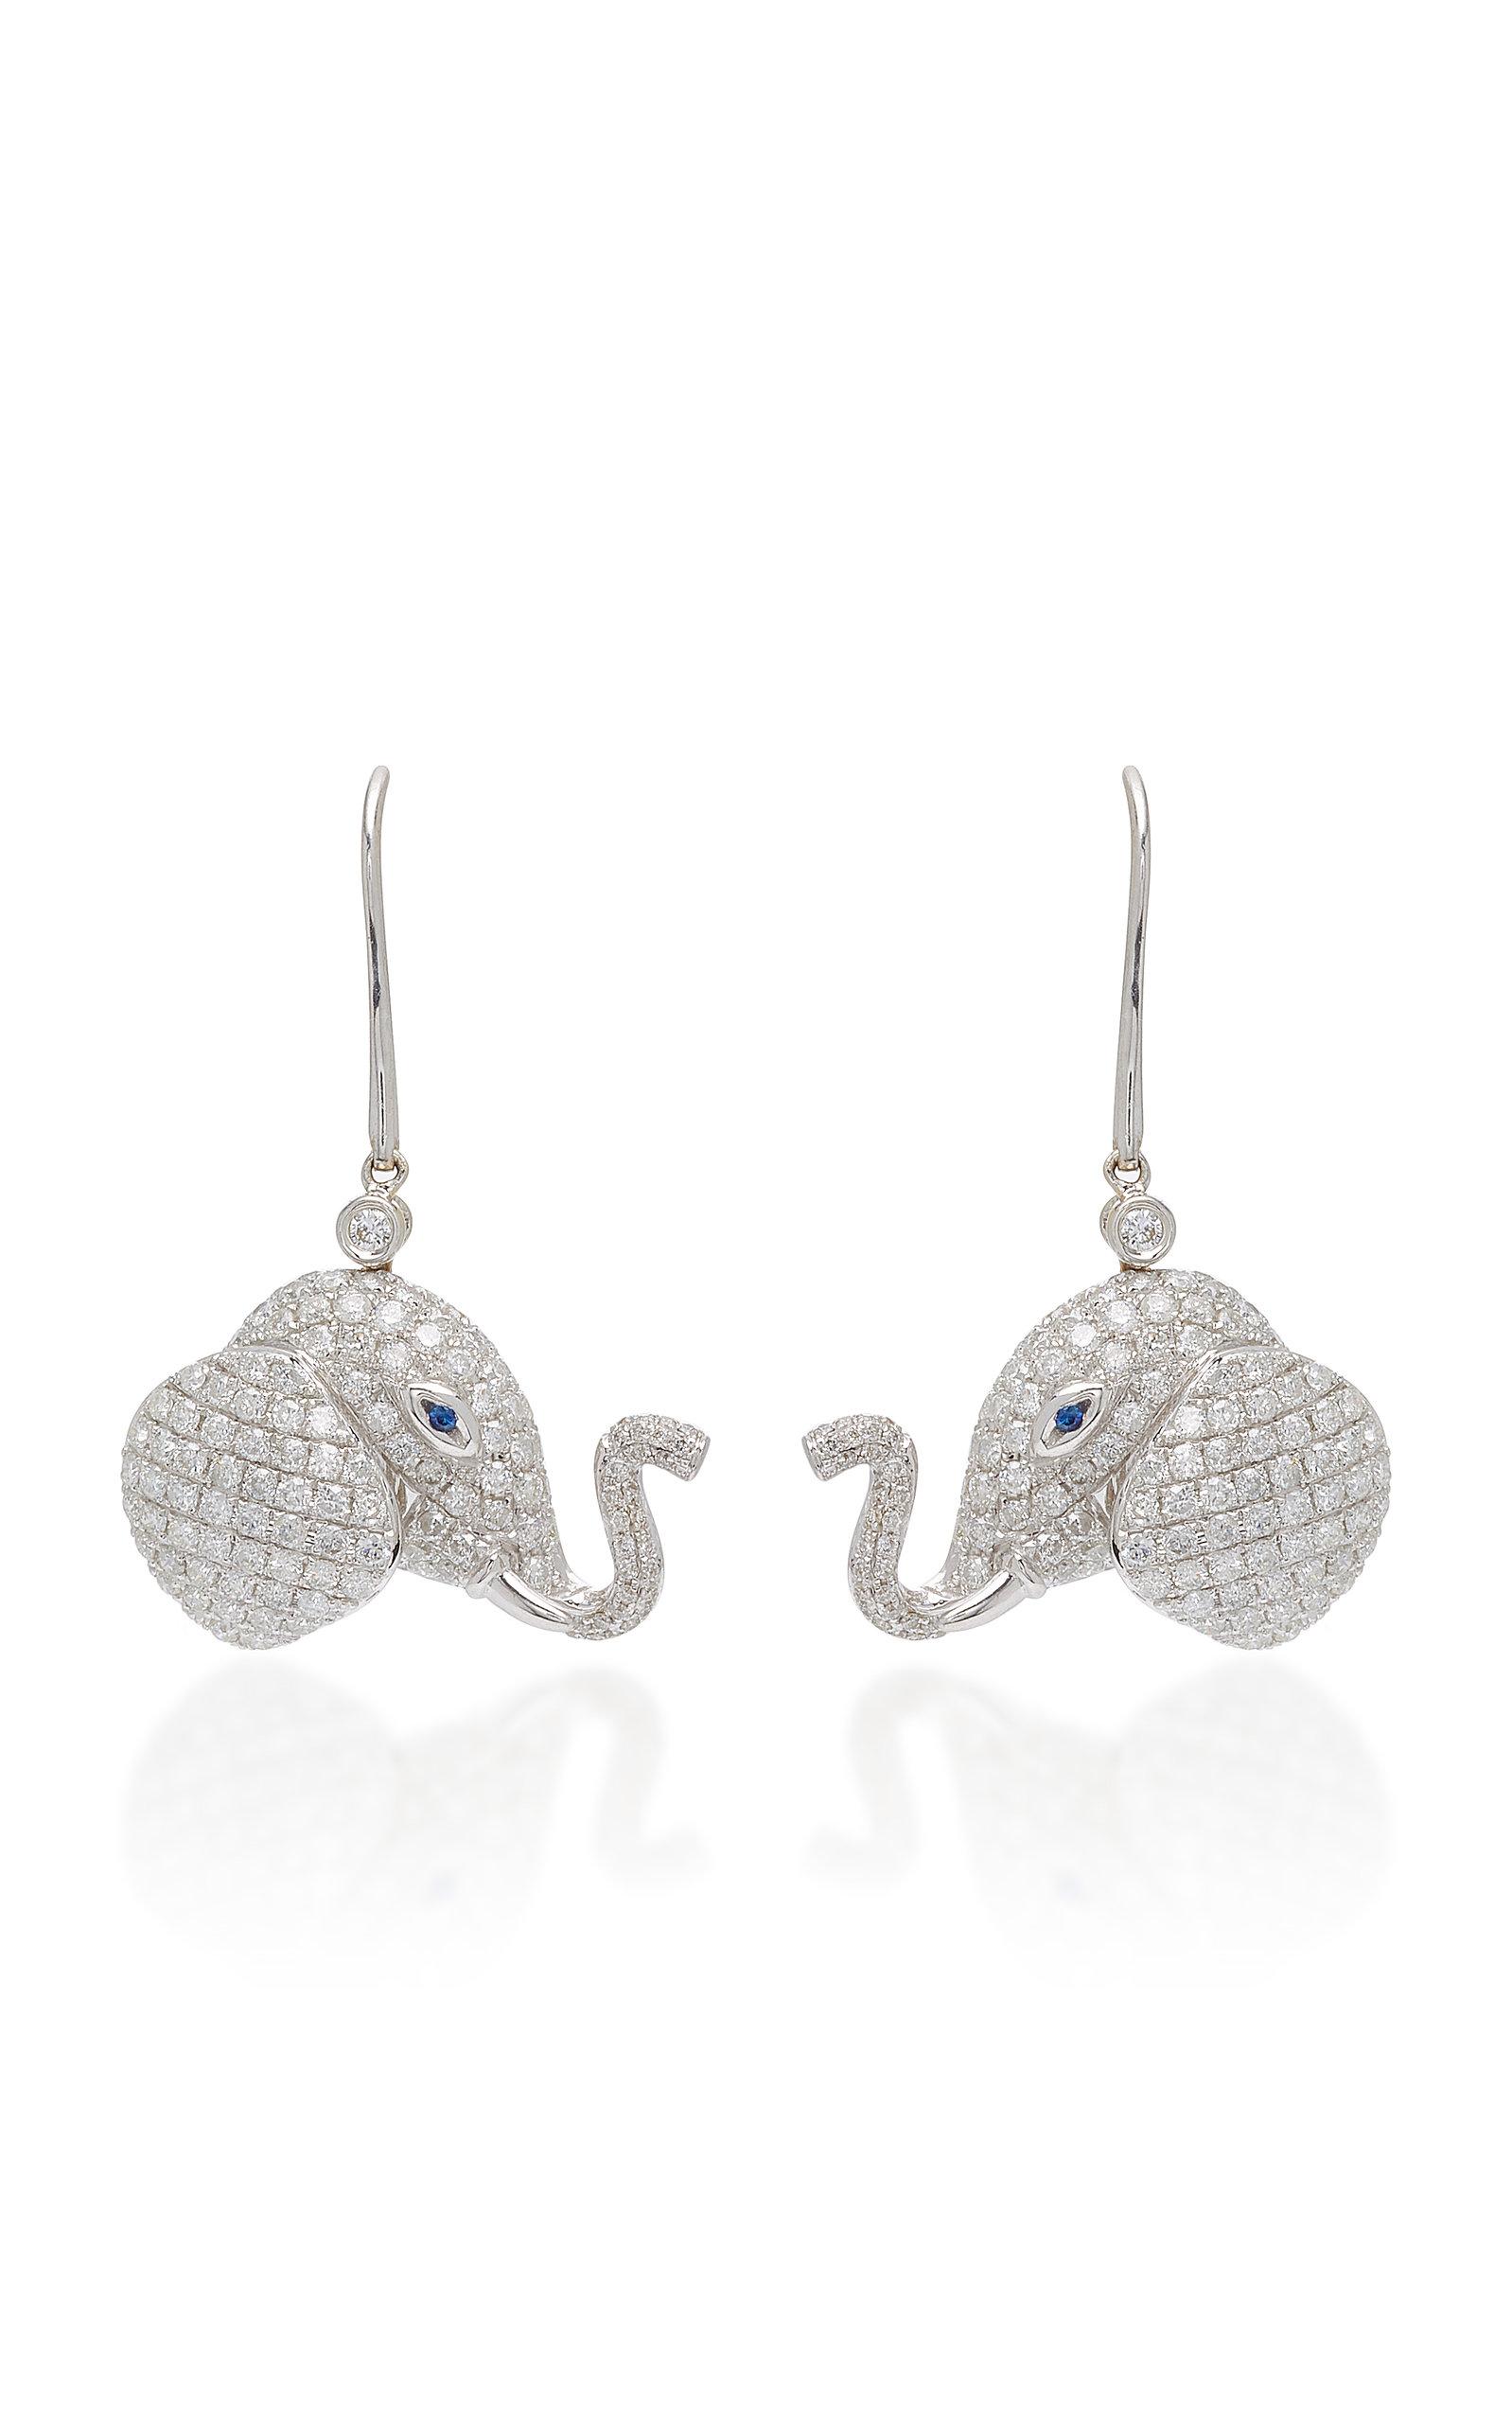 OFIRA WHITE DIAMOND ELEPHANT DROP EARRINGS